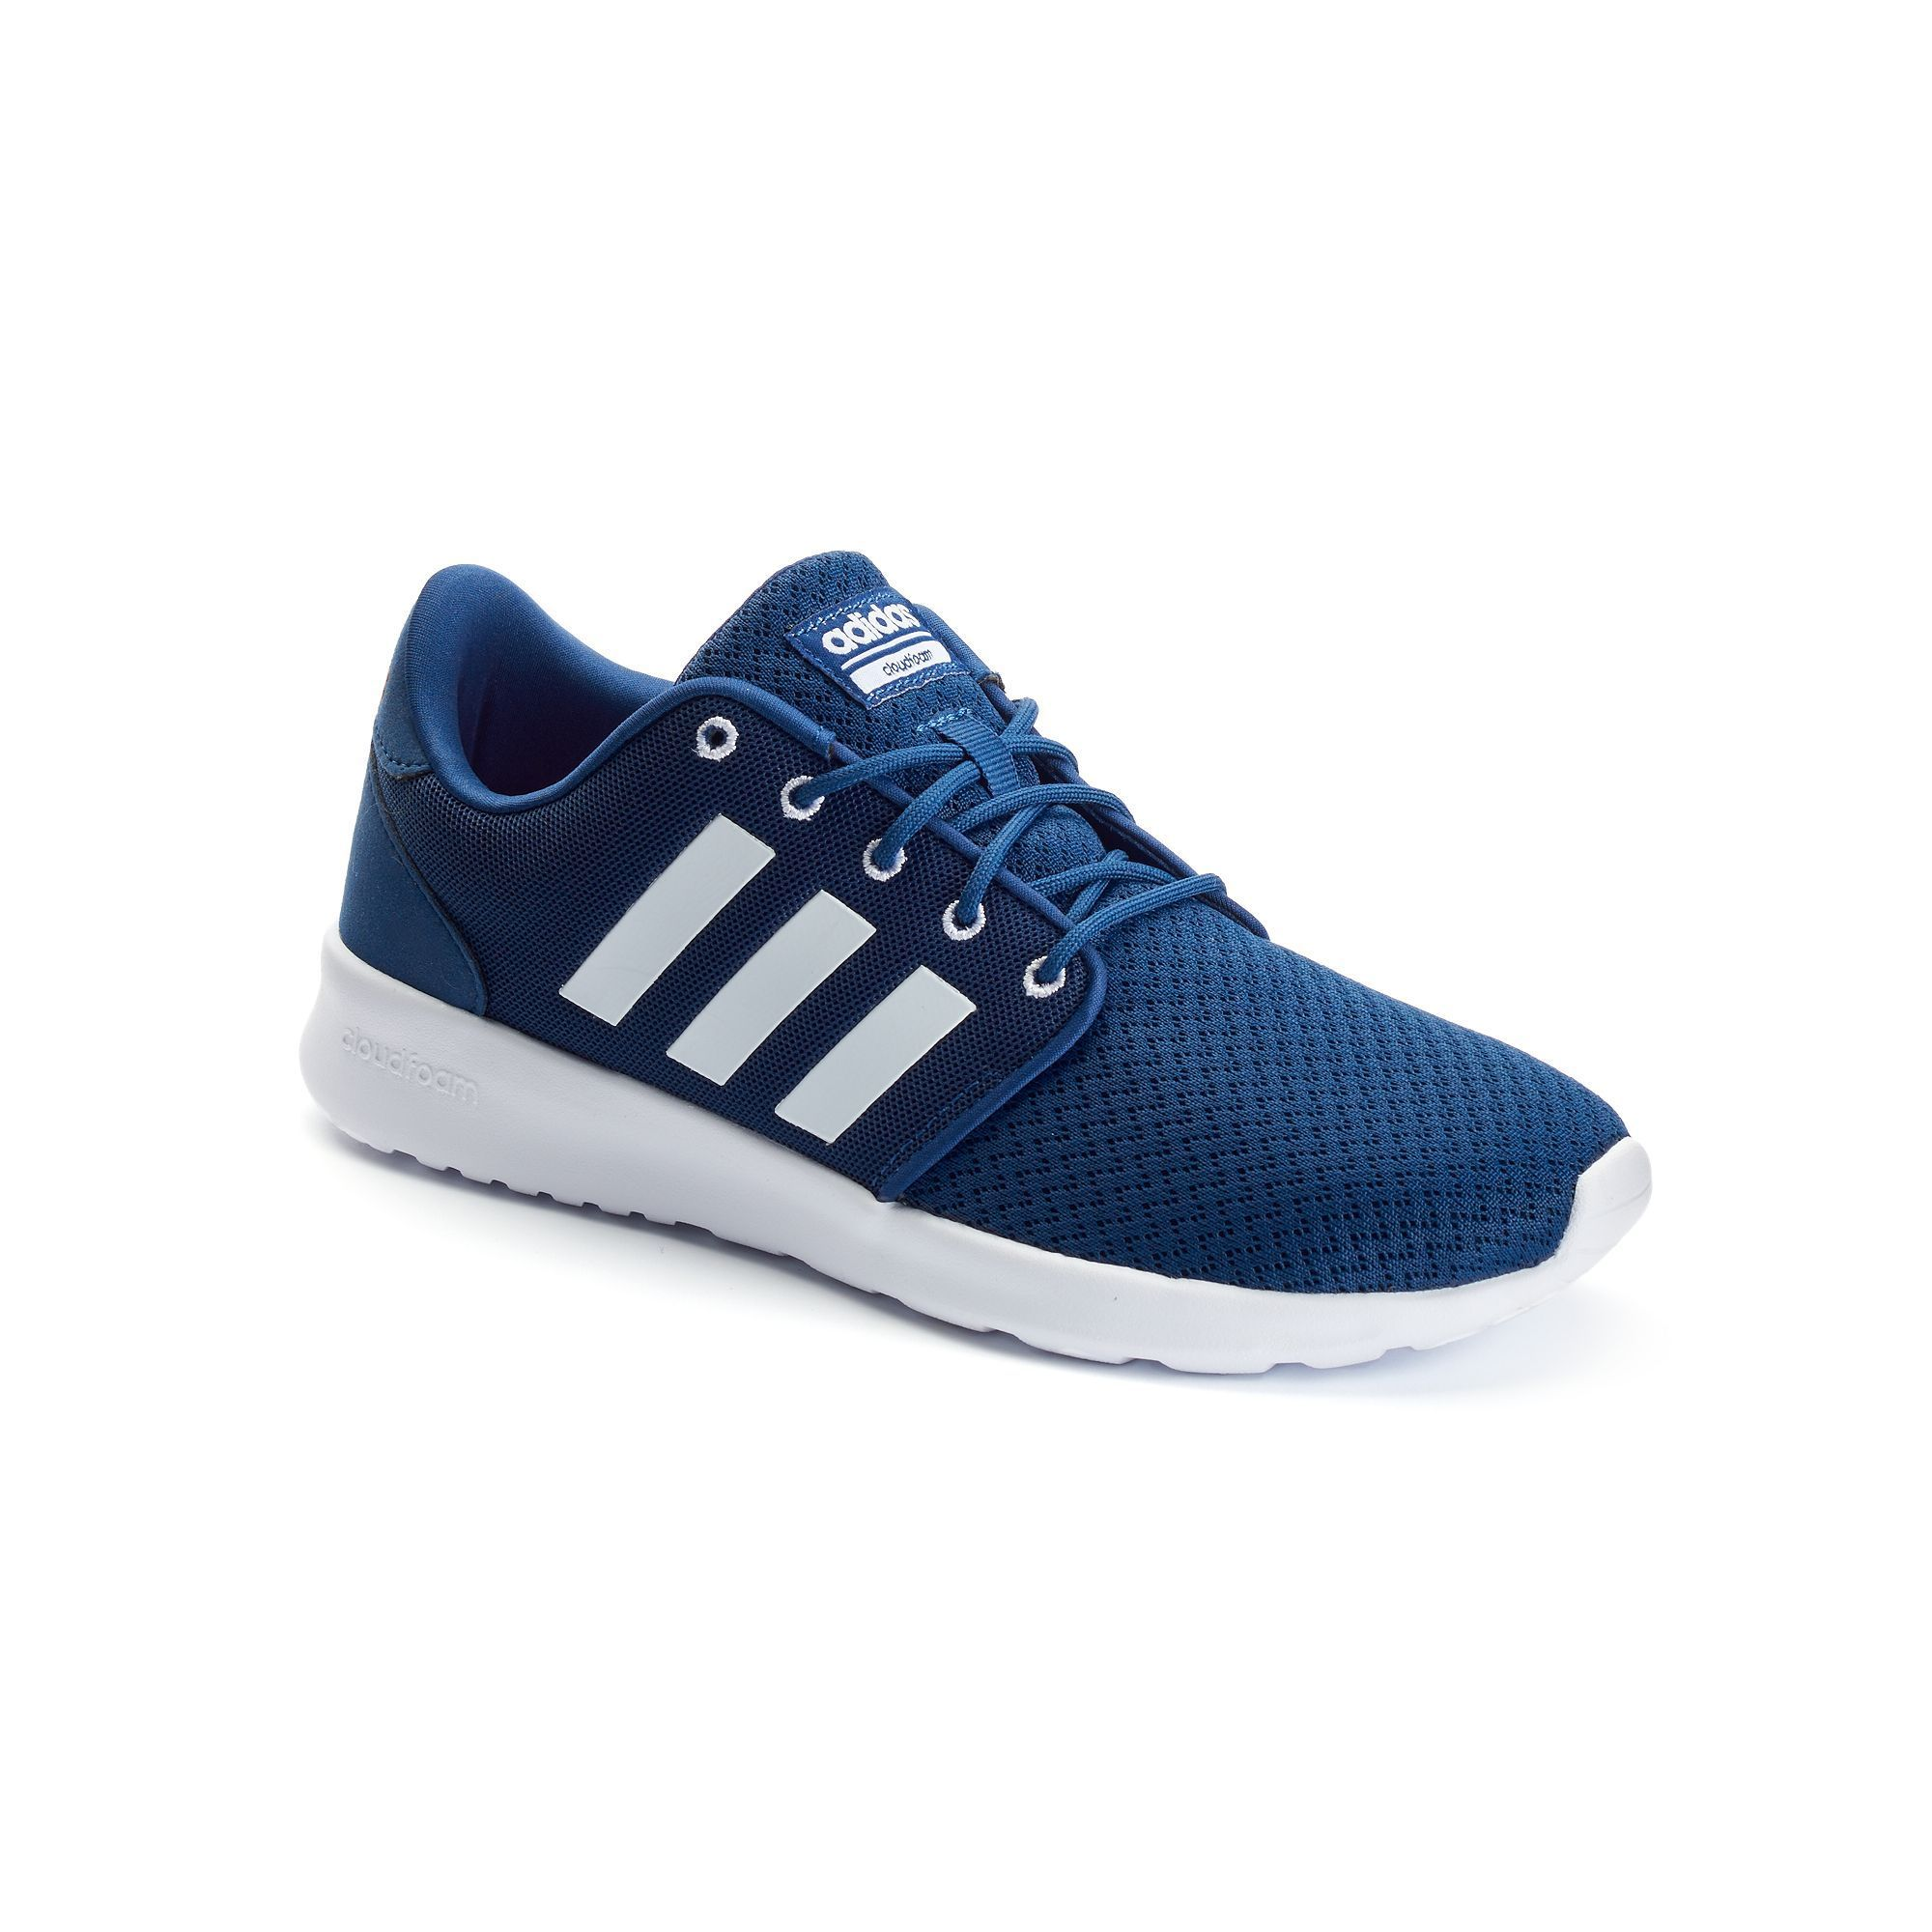 quality design fbd29 b209e Adidas NEO Cloudfoam QT Racer Women s Shoes, Size  6.5, Dark Blue